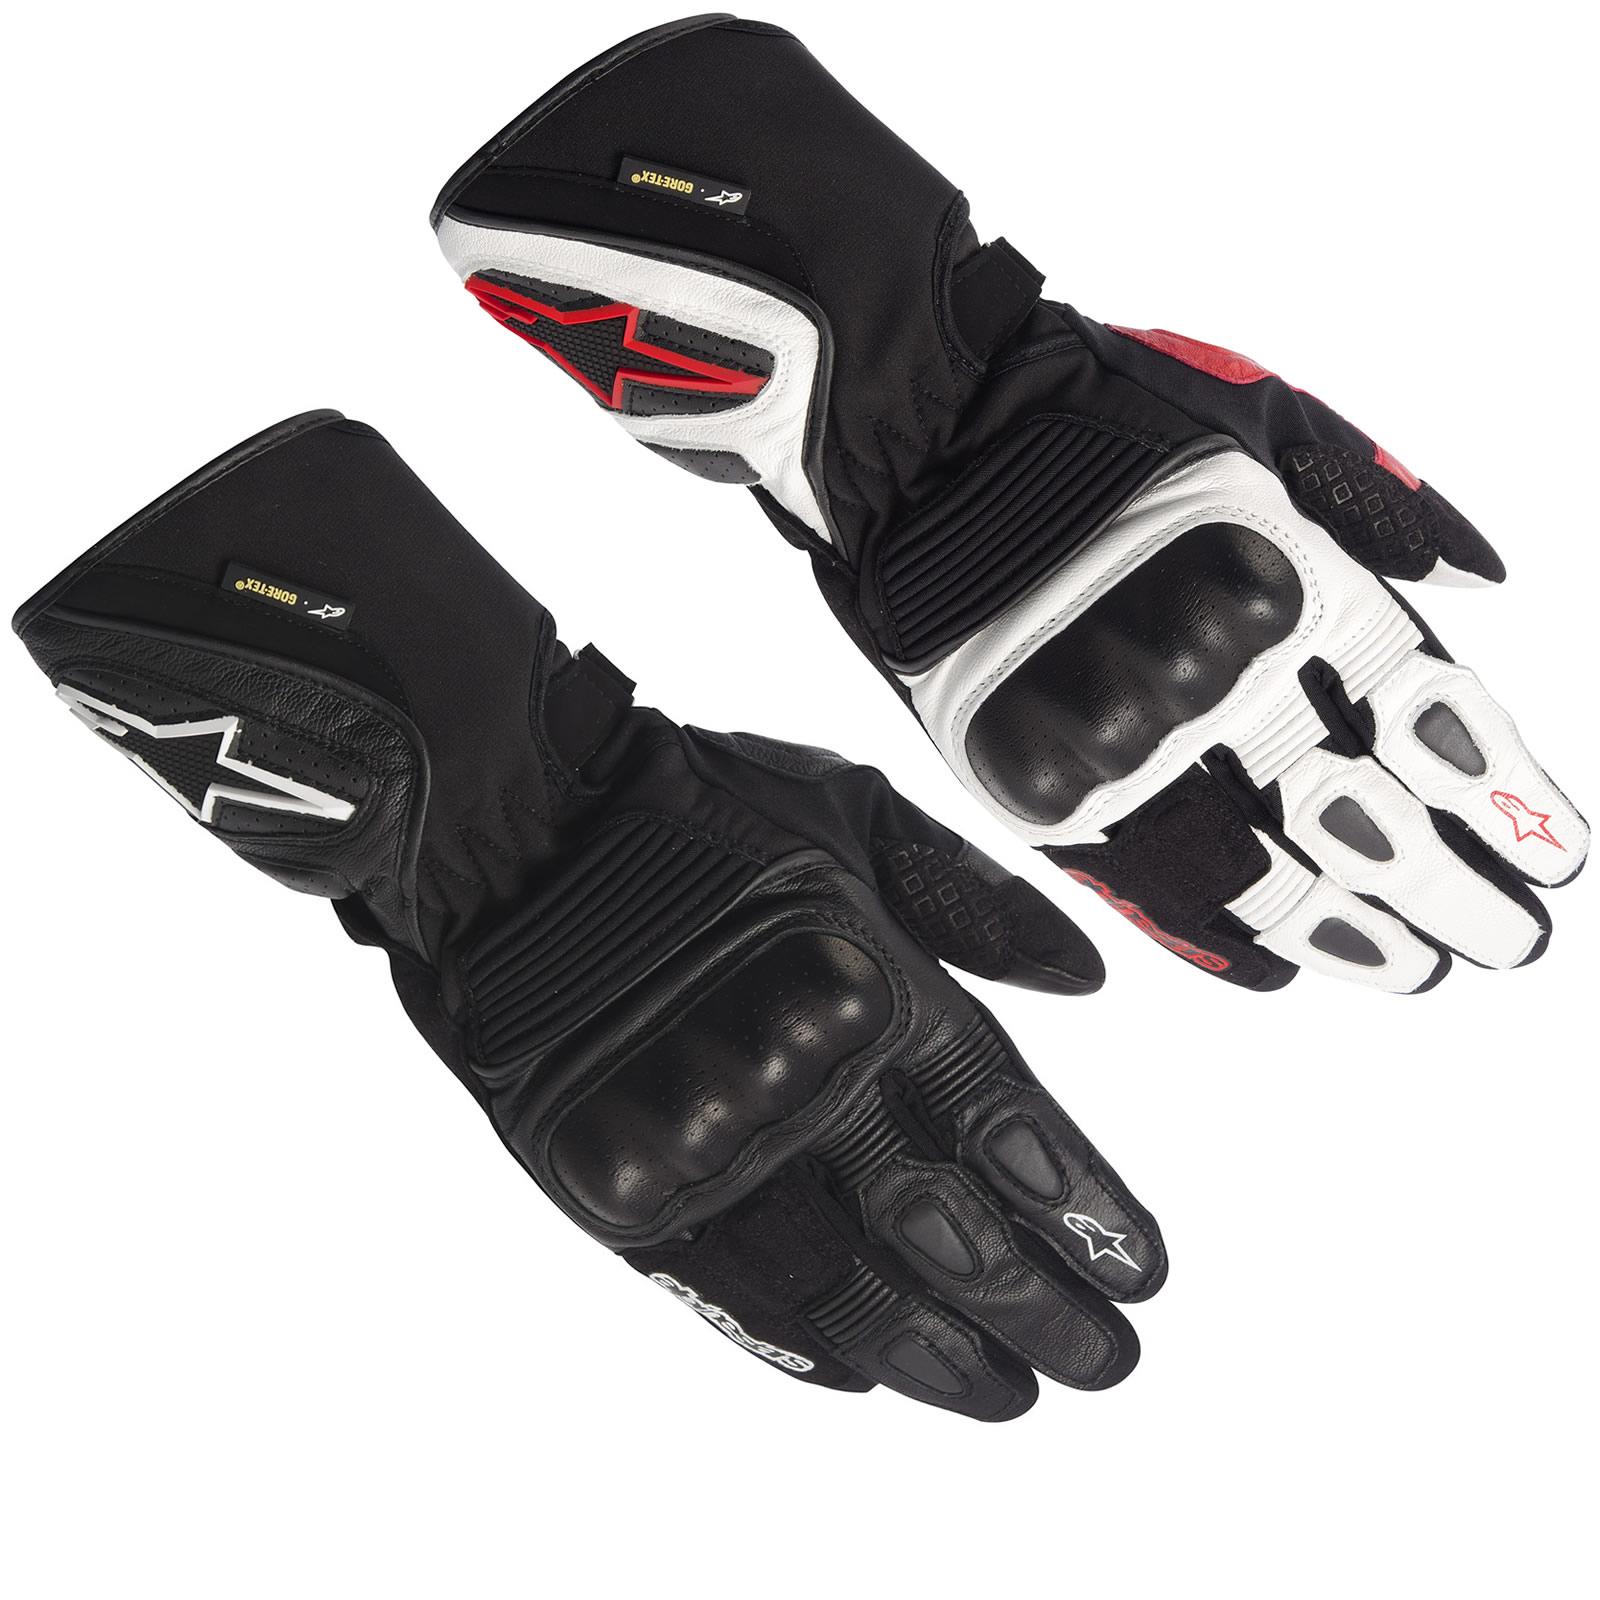 Xtrafit motorcycle gloves - Thumbnail 1